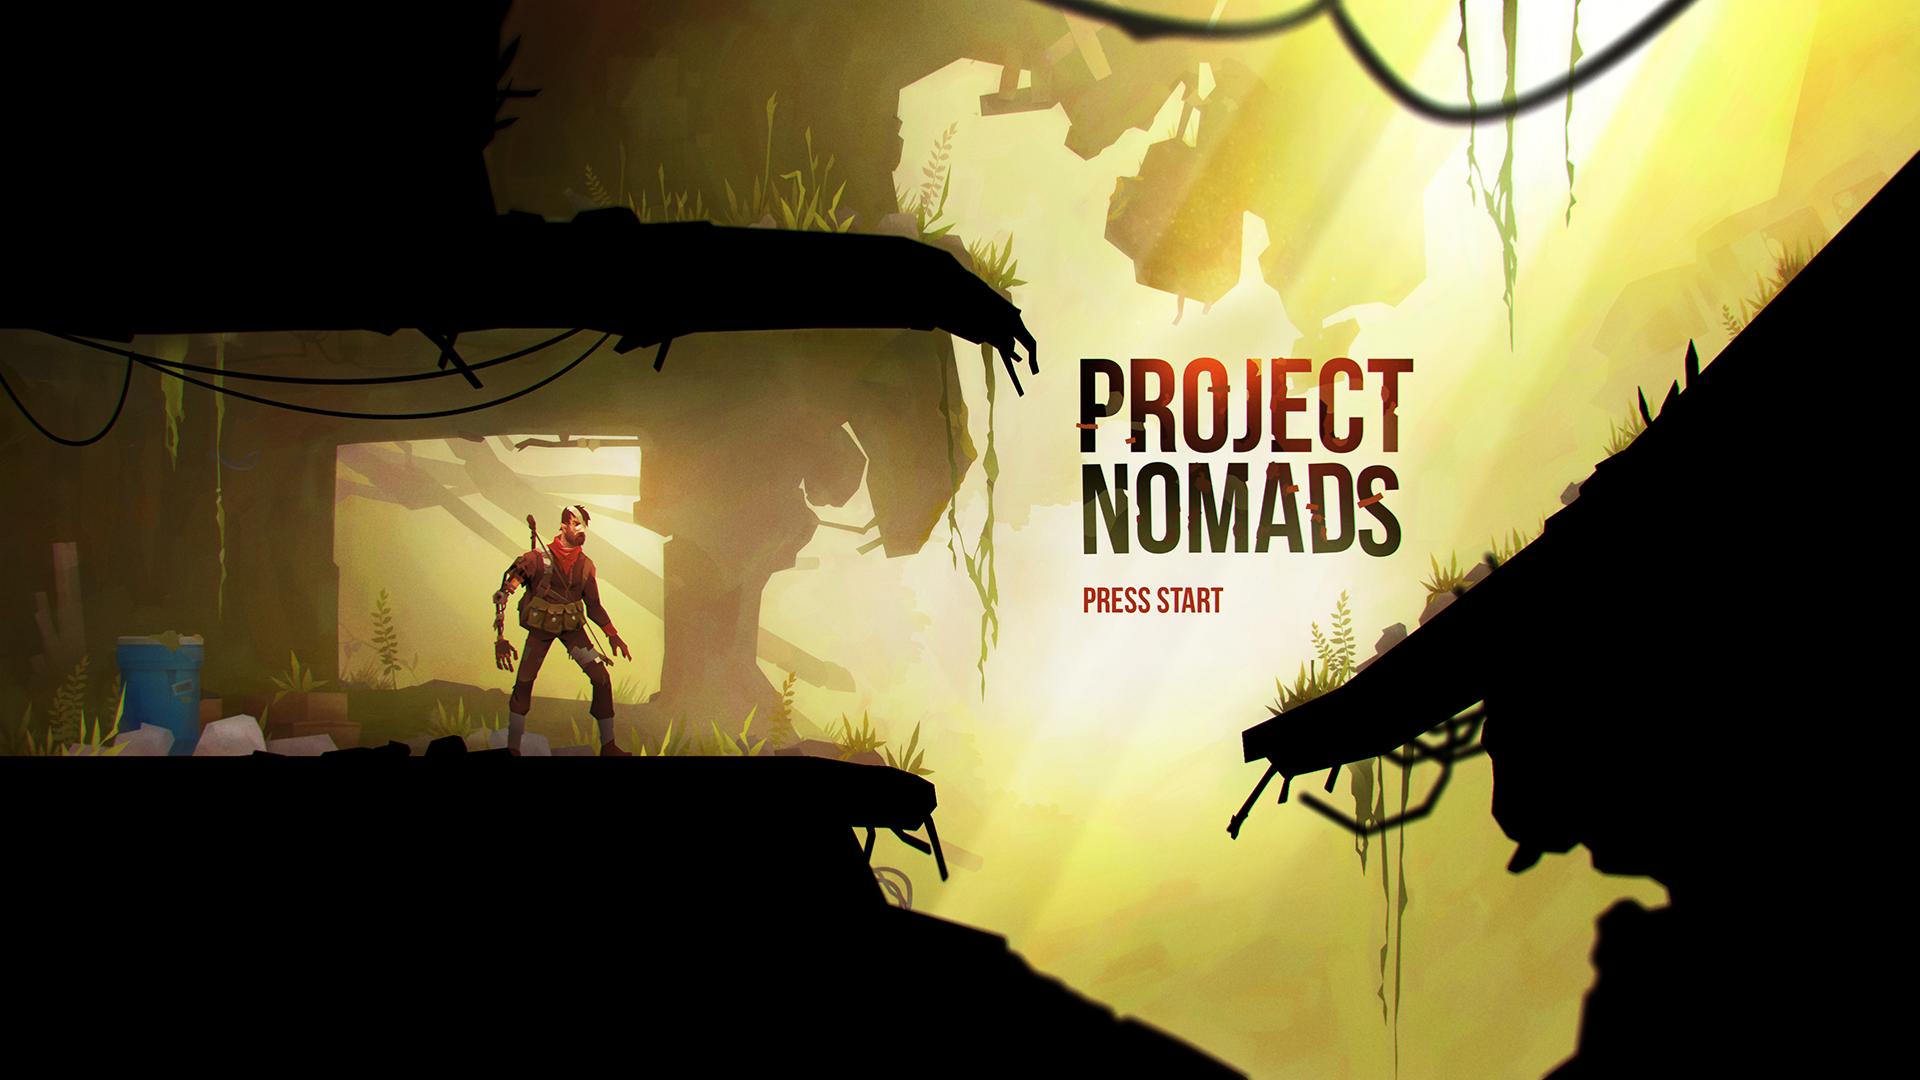 Project Nomads, Salt, False perceptions